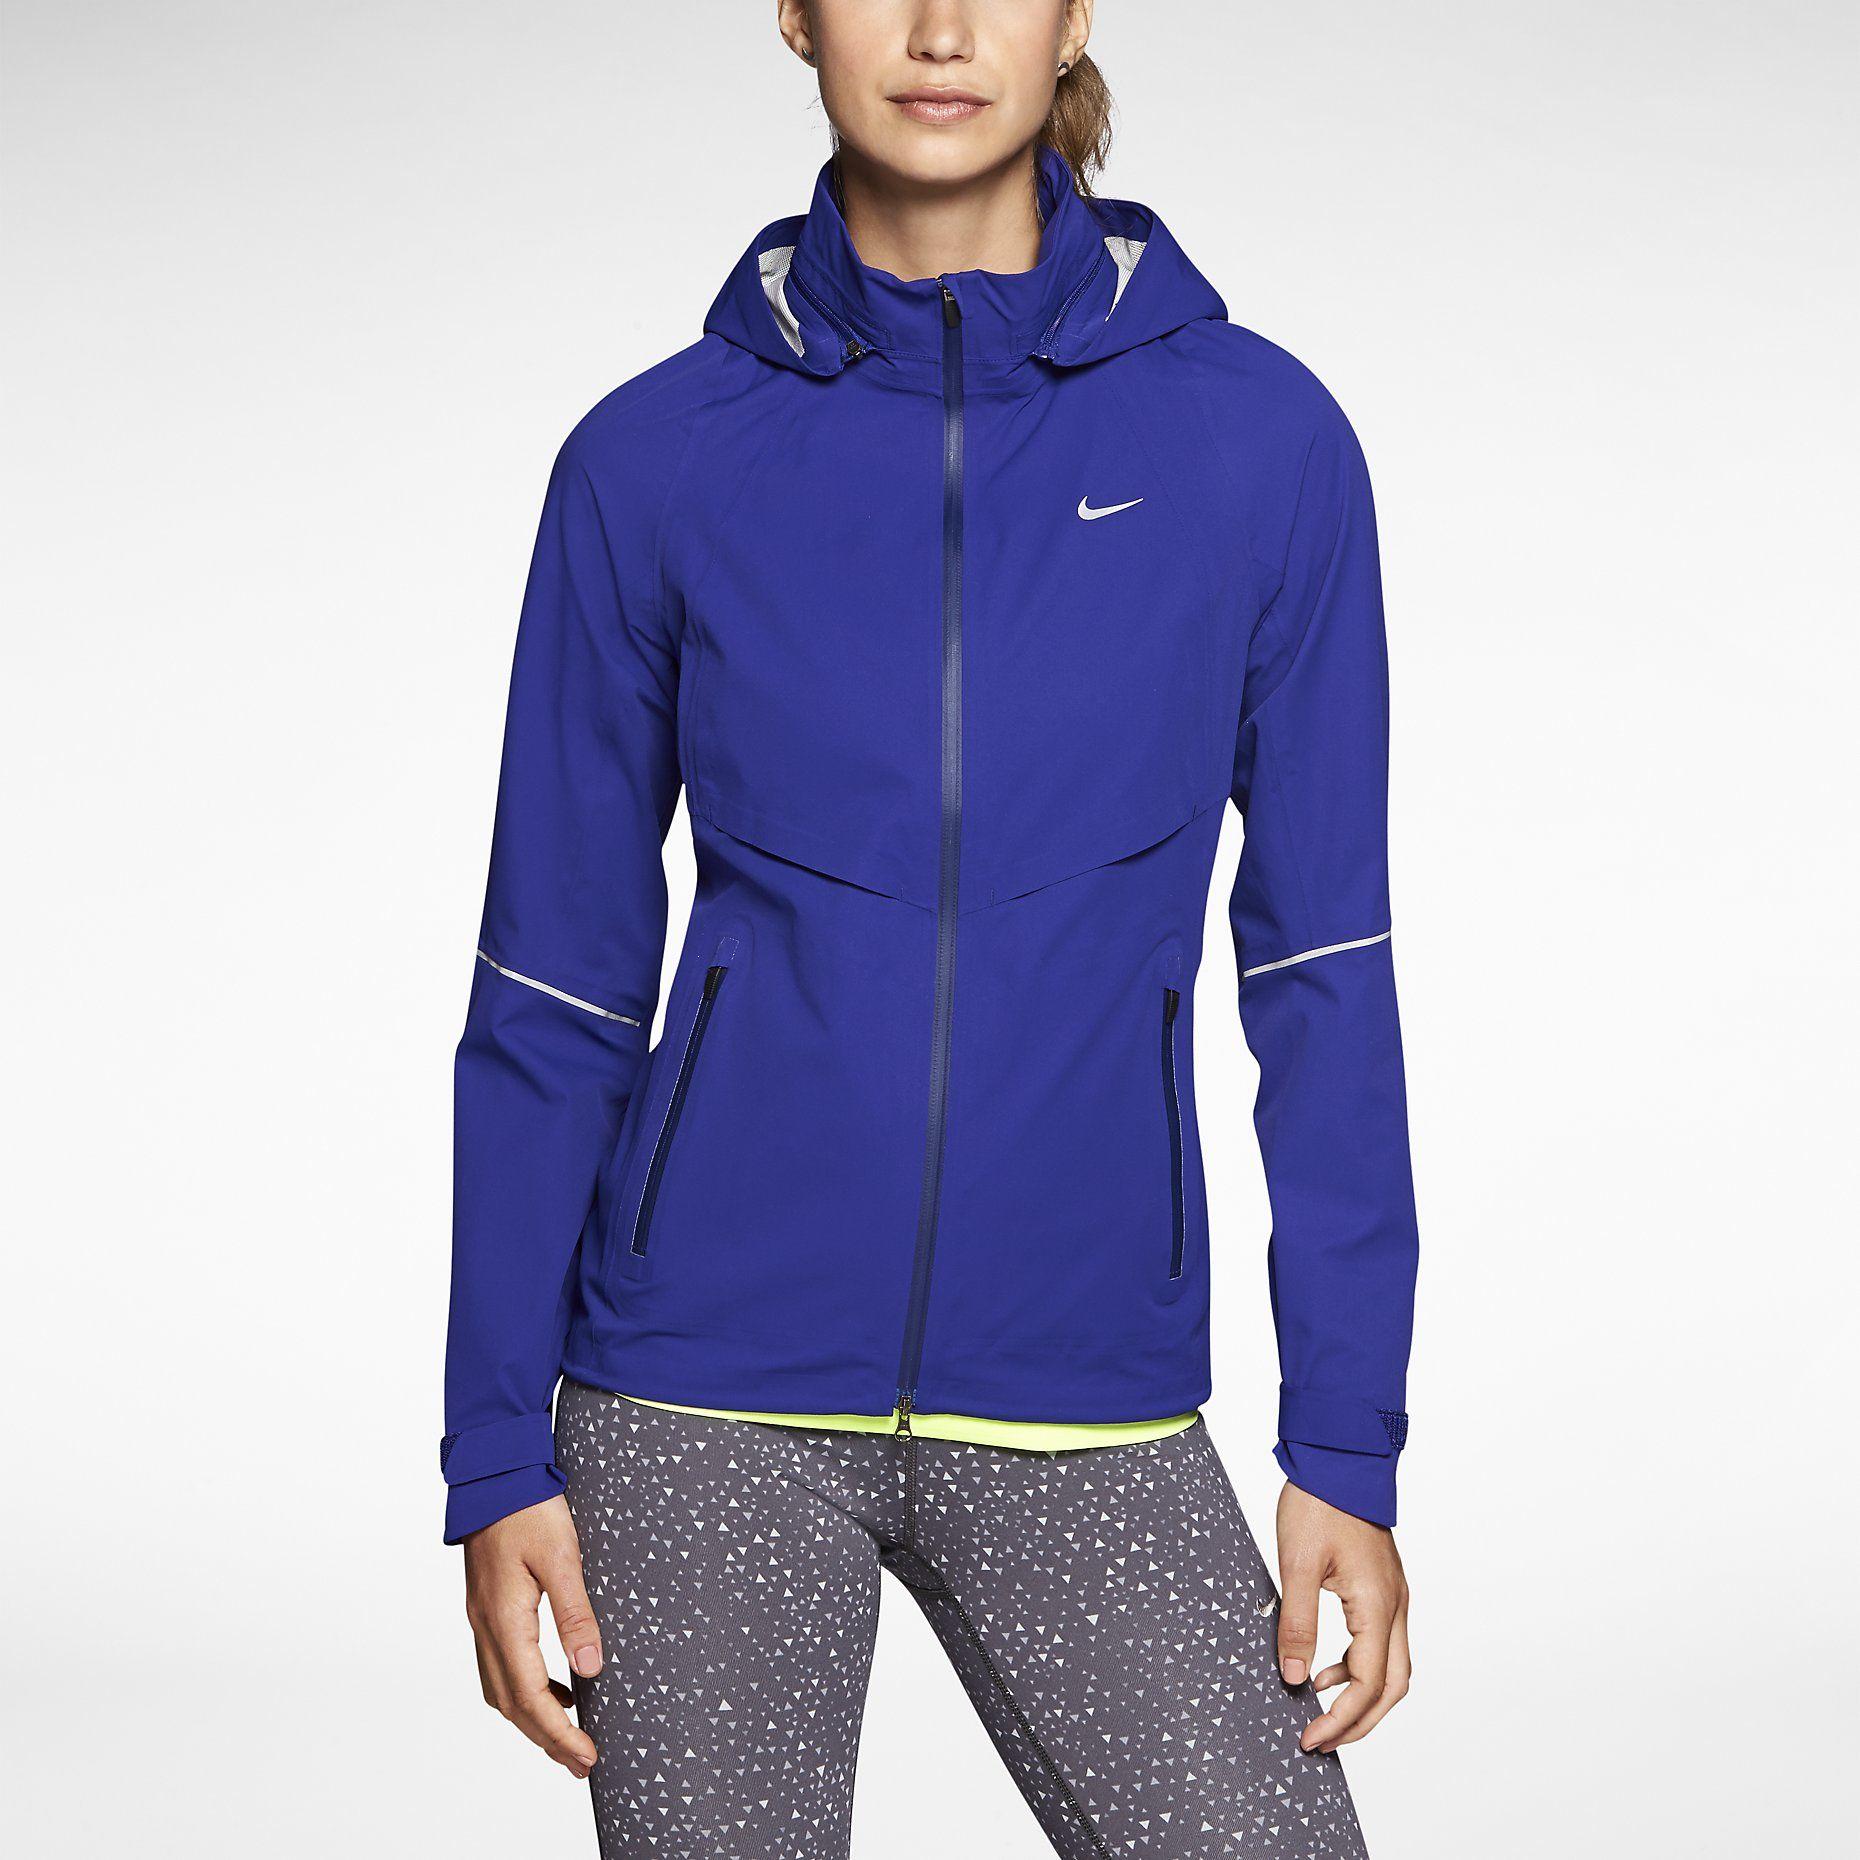 403b026d7092 Nike Rain Runner Women s Running Jacket. Nike Store